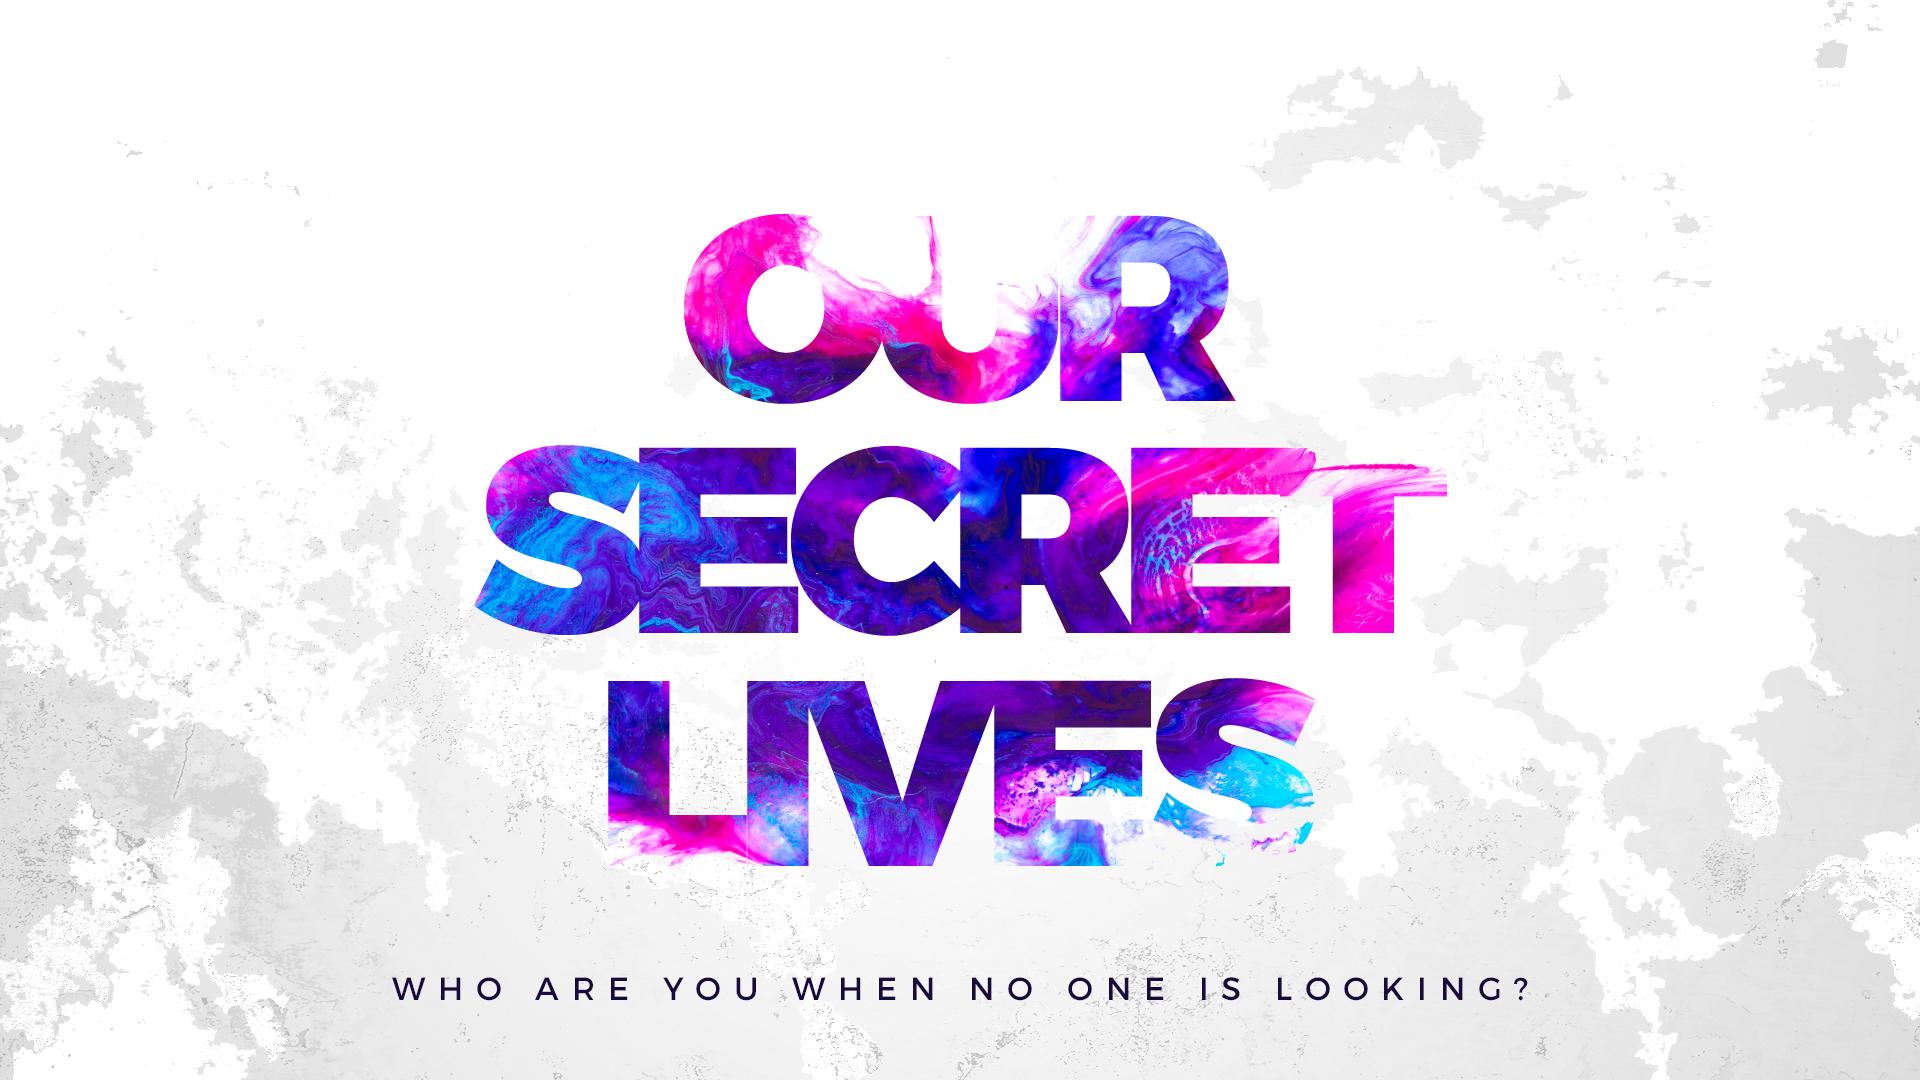 our-secret-lives-1920x1080 (1).jpg